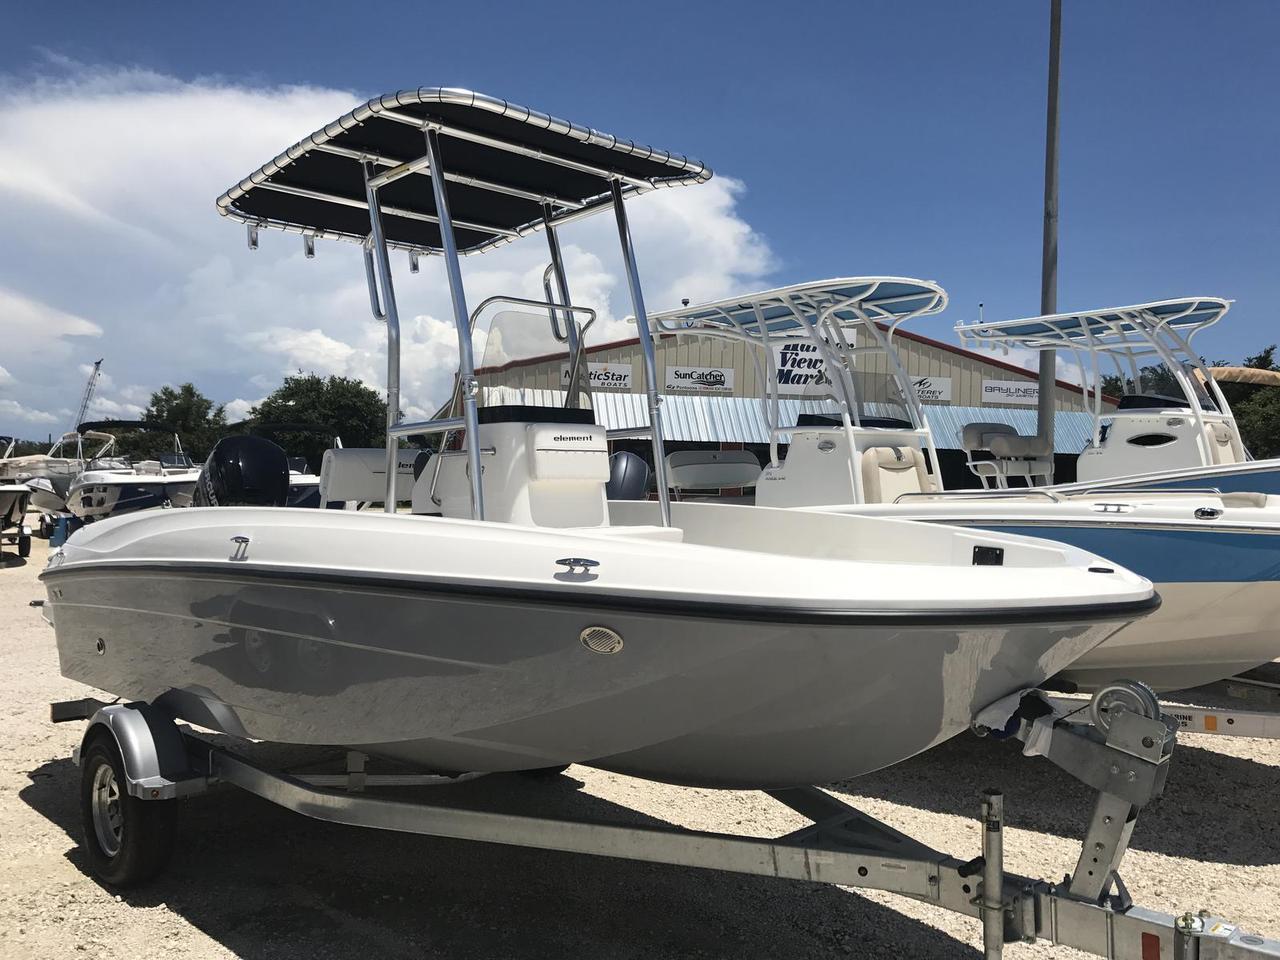 2018 new bayliner elementelement center console fishing for Center console fishing boats for sale